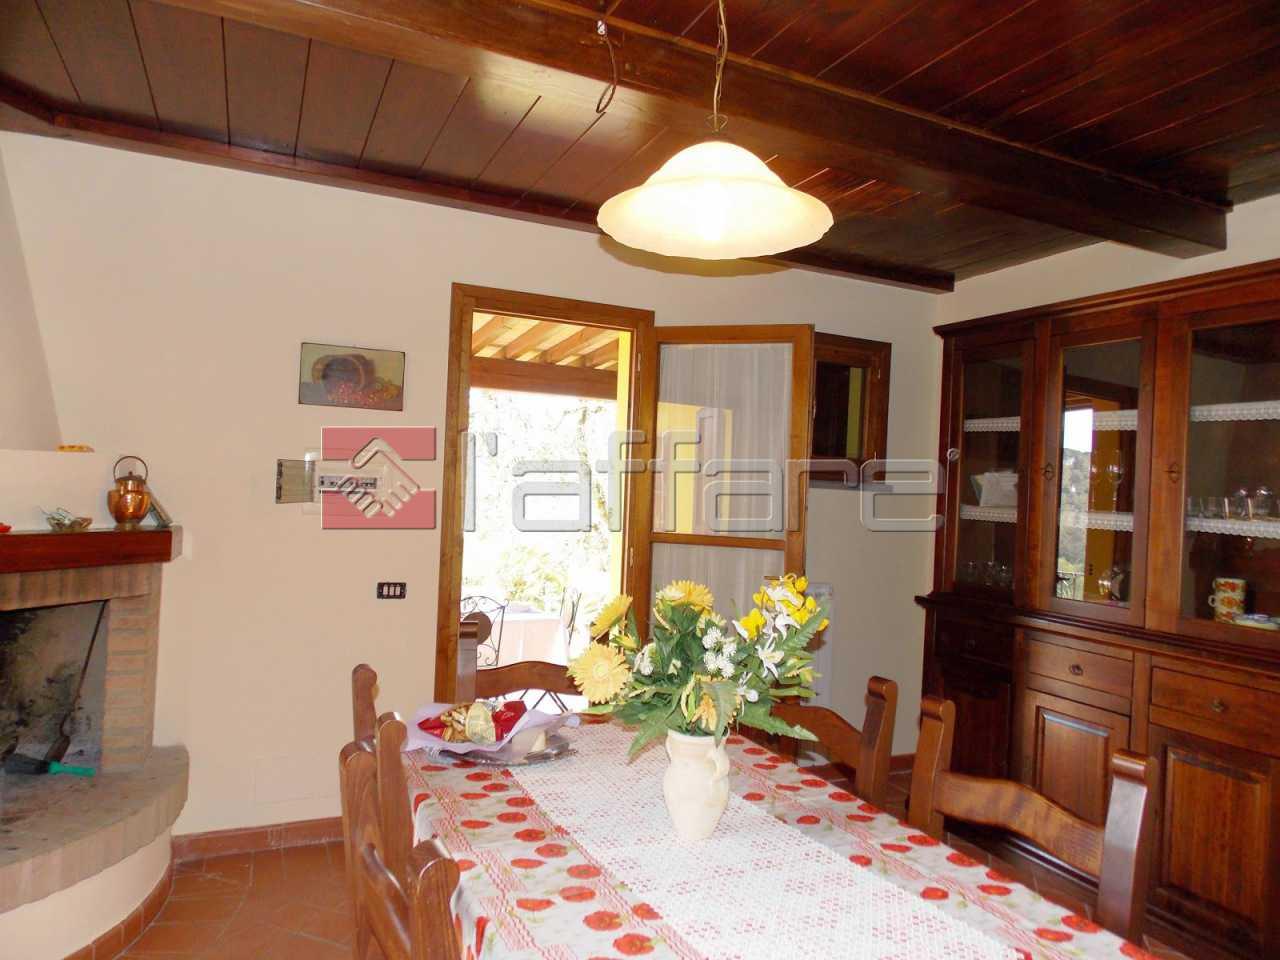 Colonica a Montopoli in Val d'Arno (4/5)